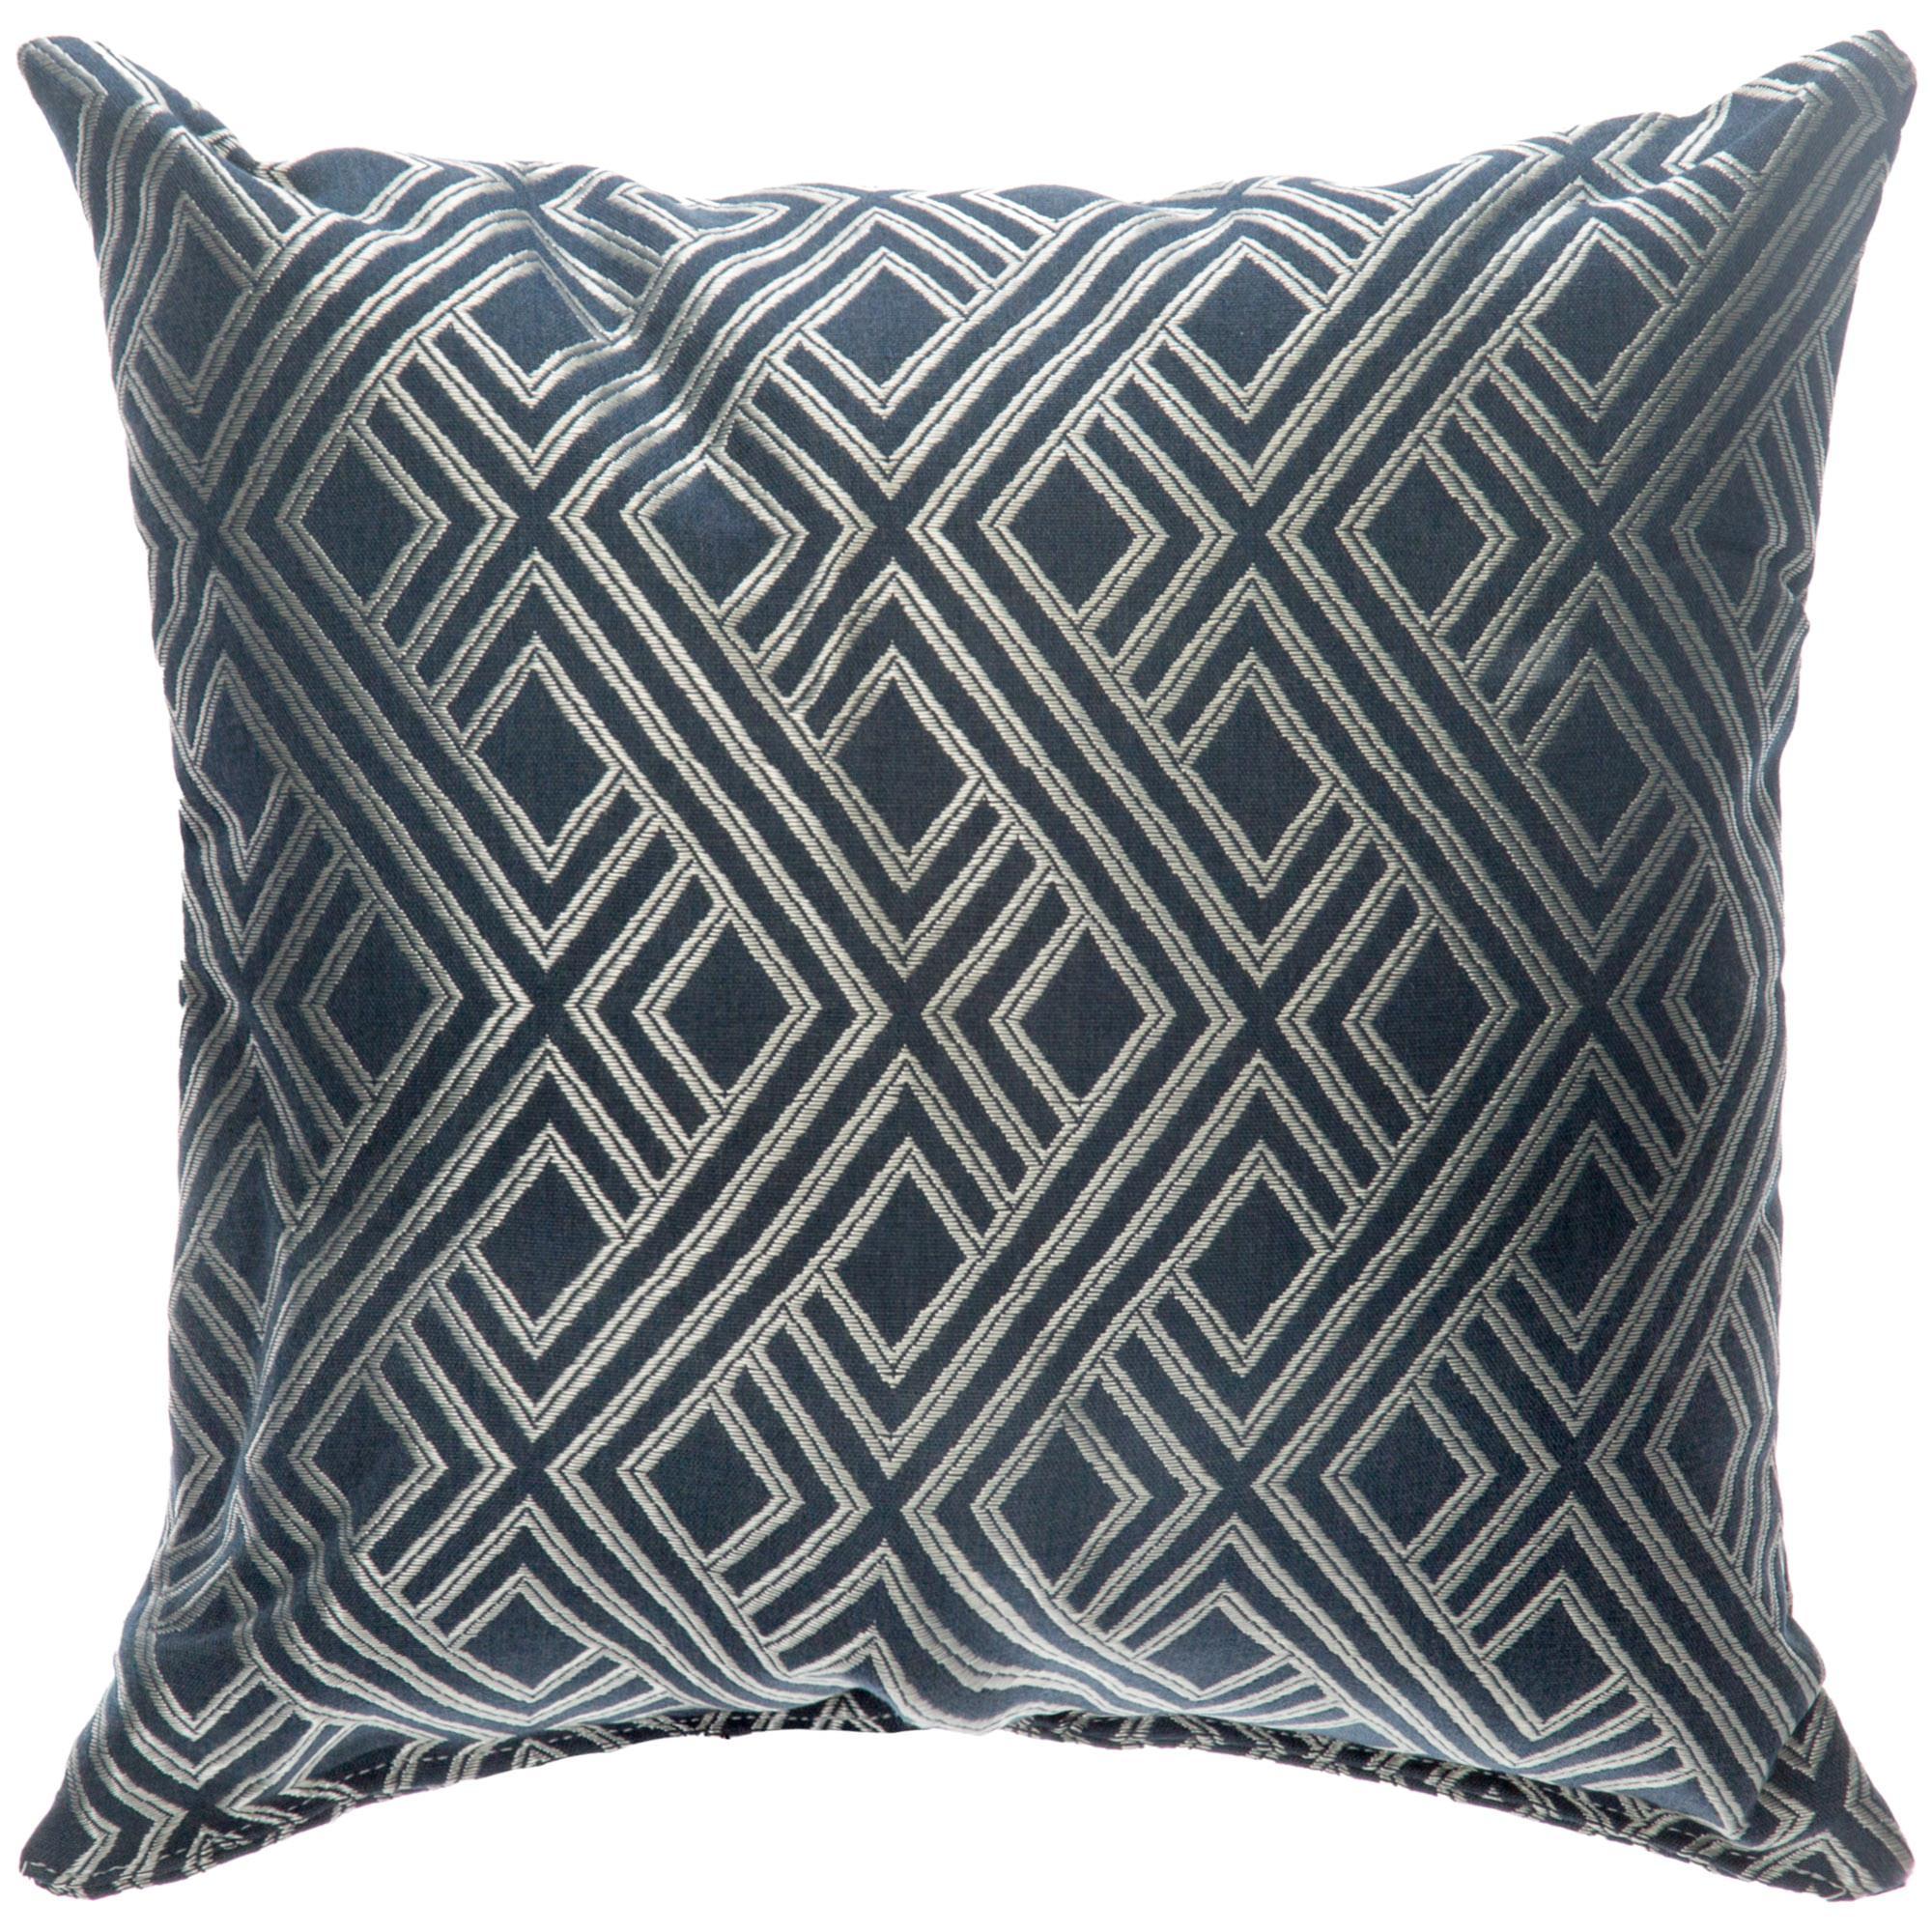 pawleys island hammocks | pillows | decorative pillows Where to Find Throw Pillows